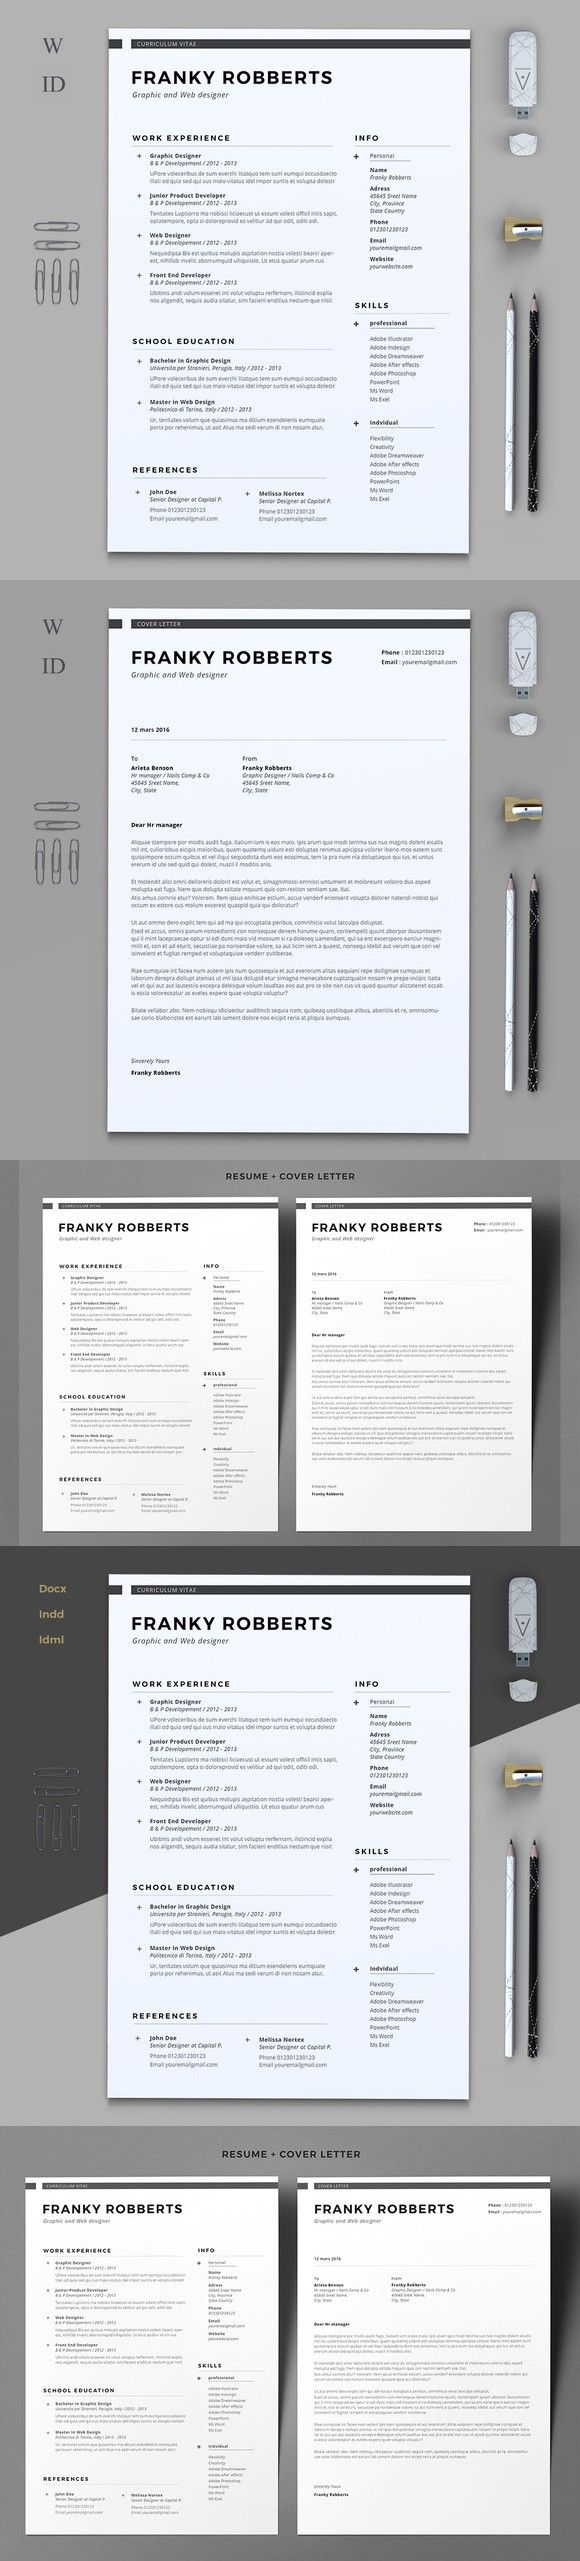 Prime Resume 769 best Resume Templates images